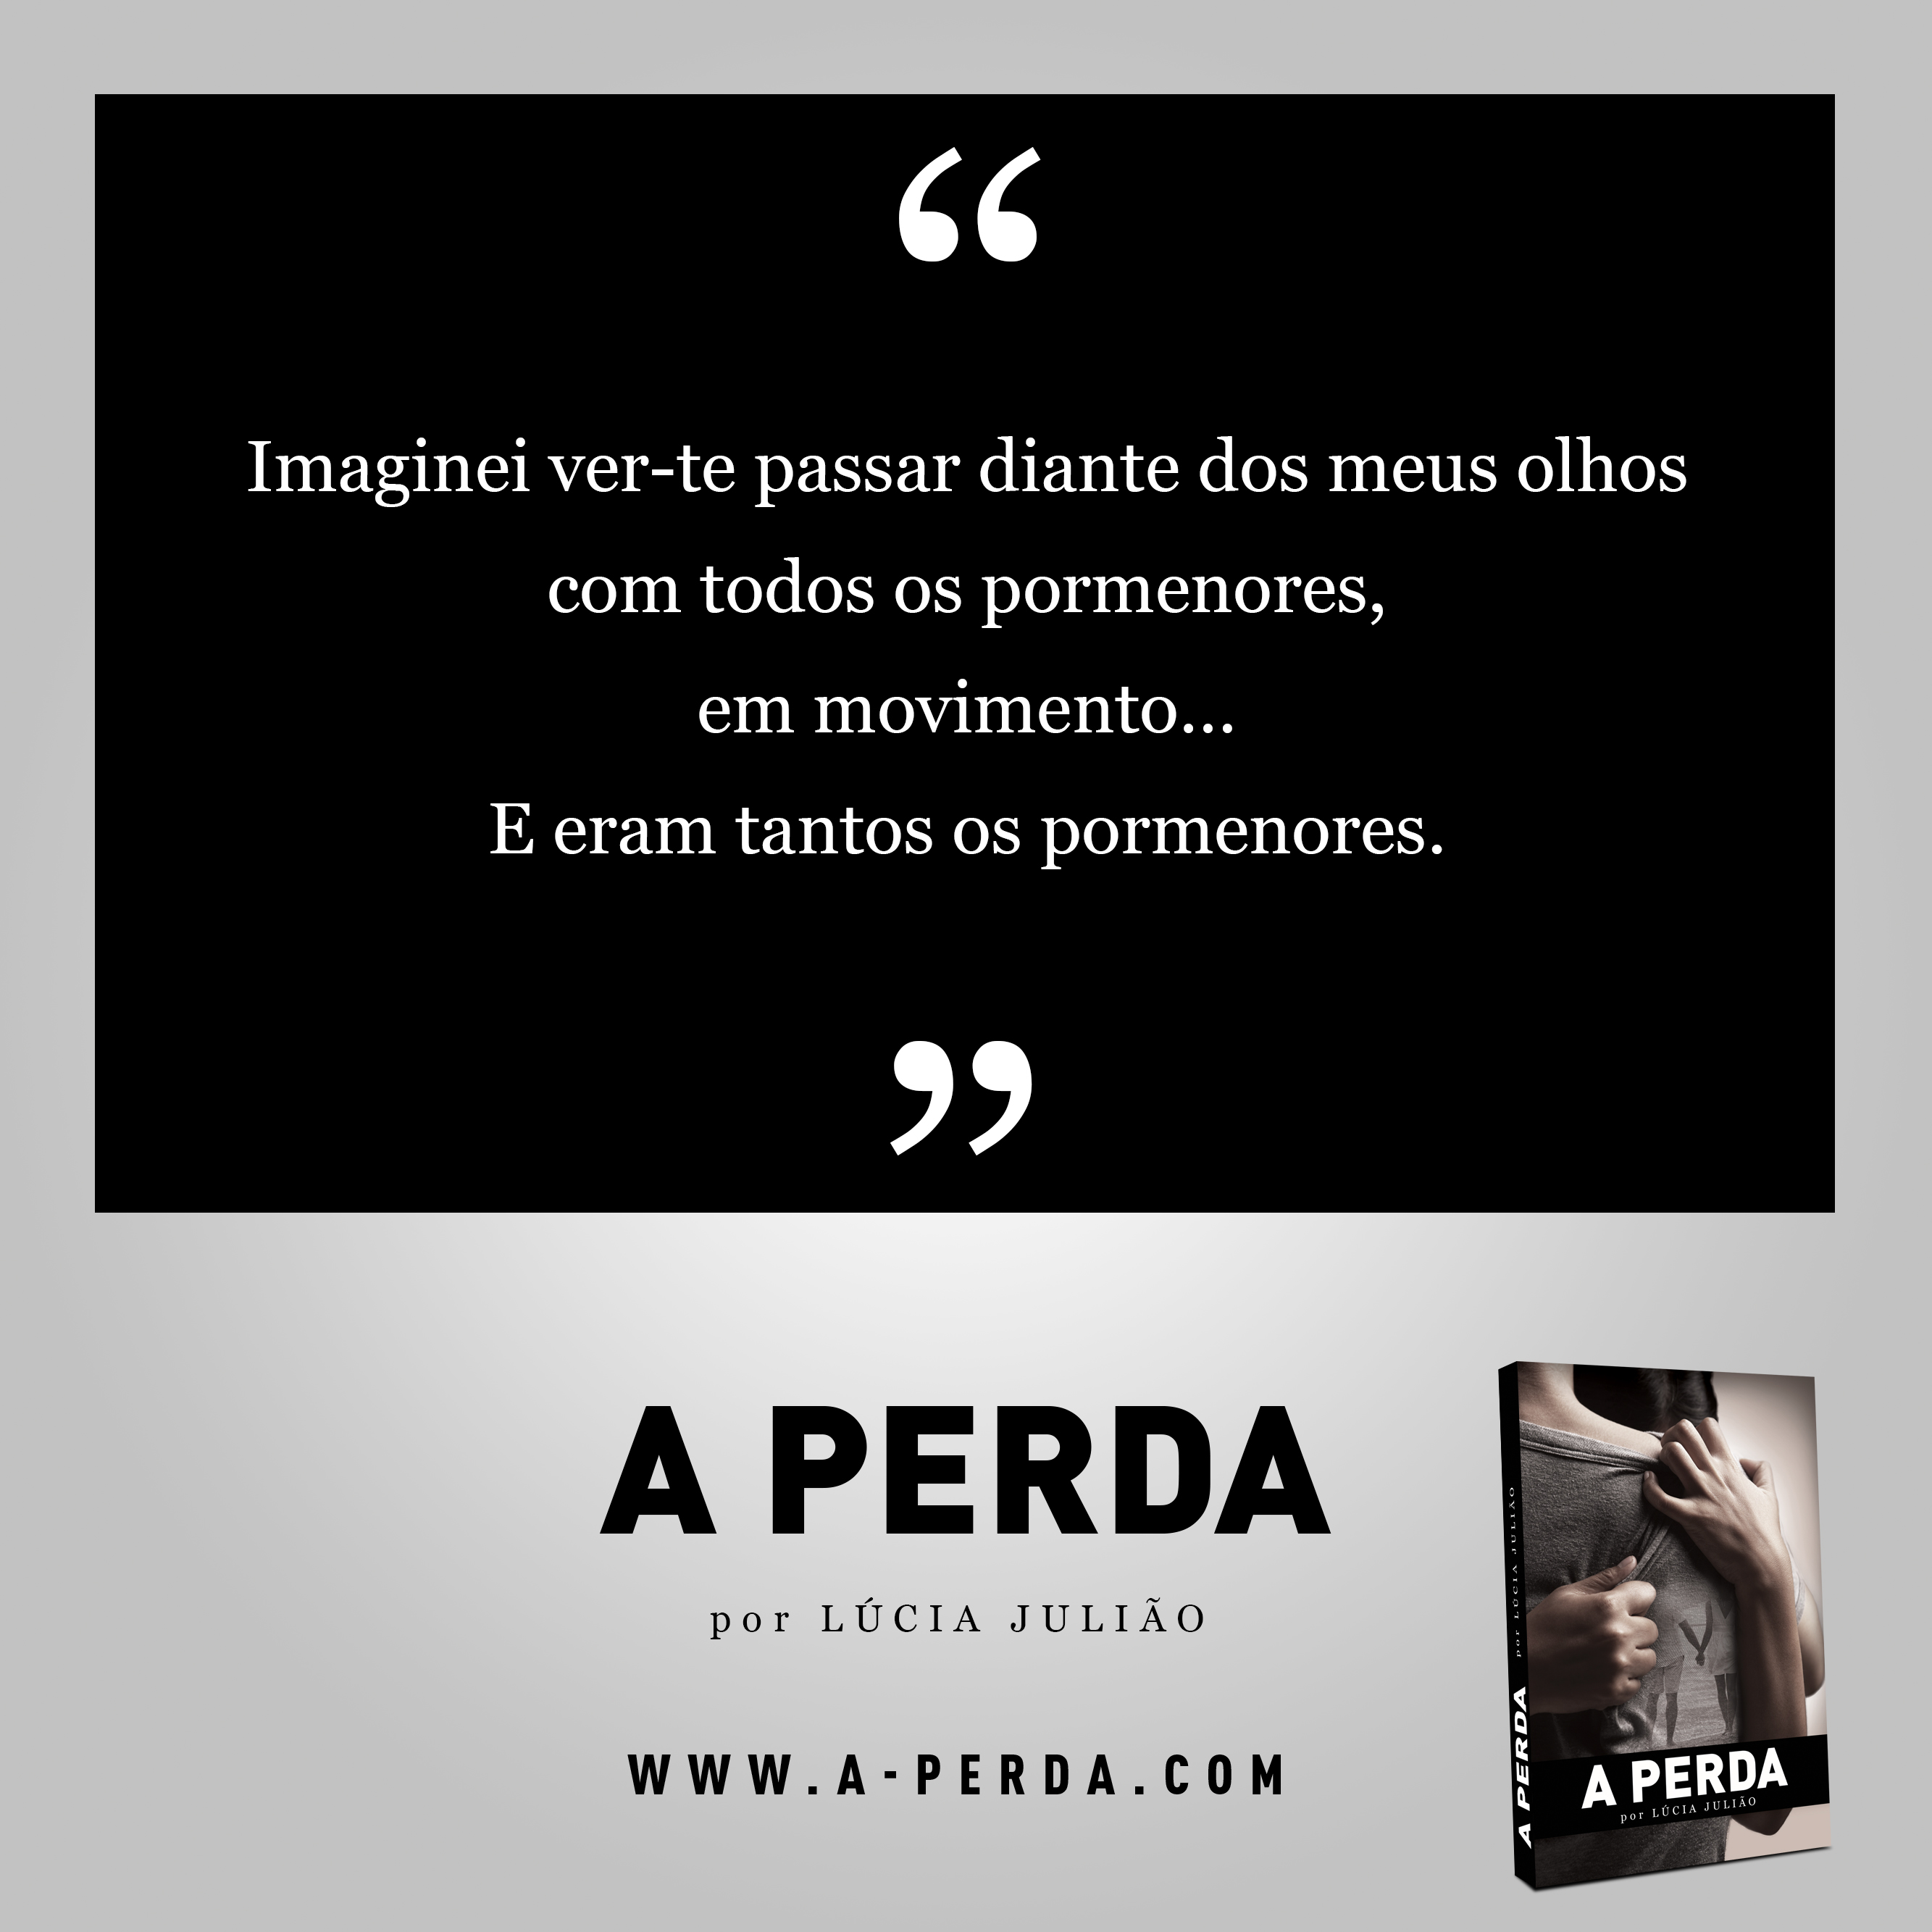 037-capitulo-50-livro-a-Perda-de-Lucia-Juliao-Instagram